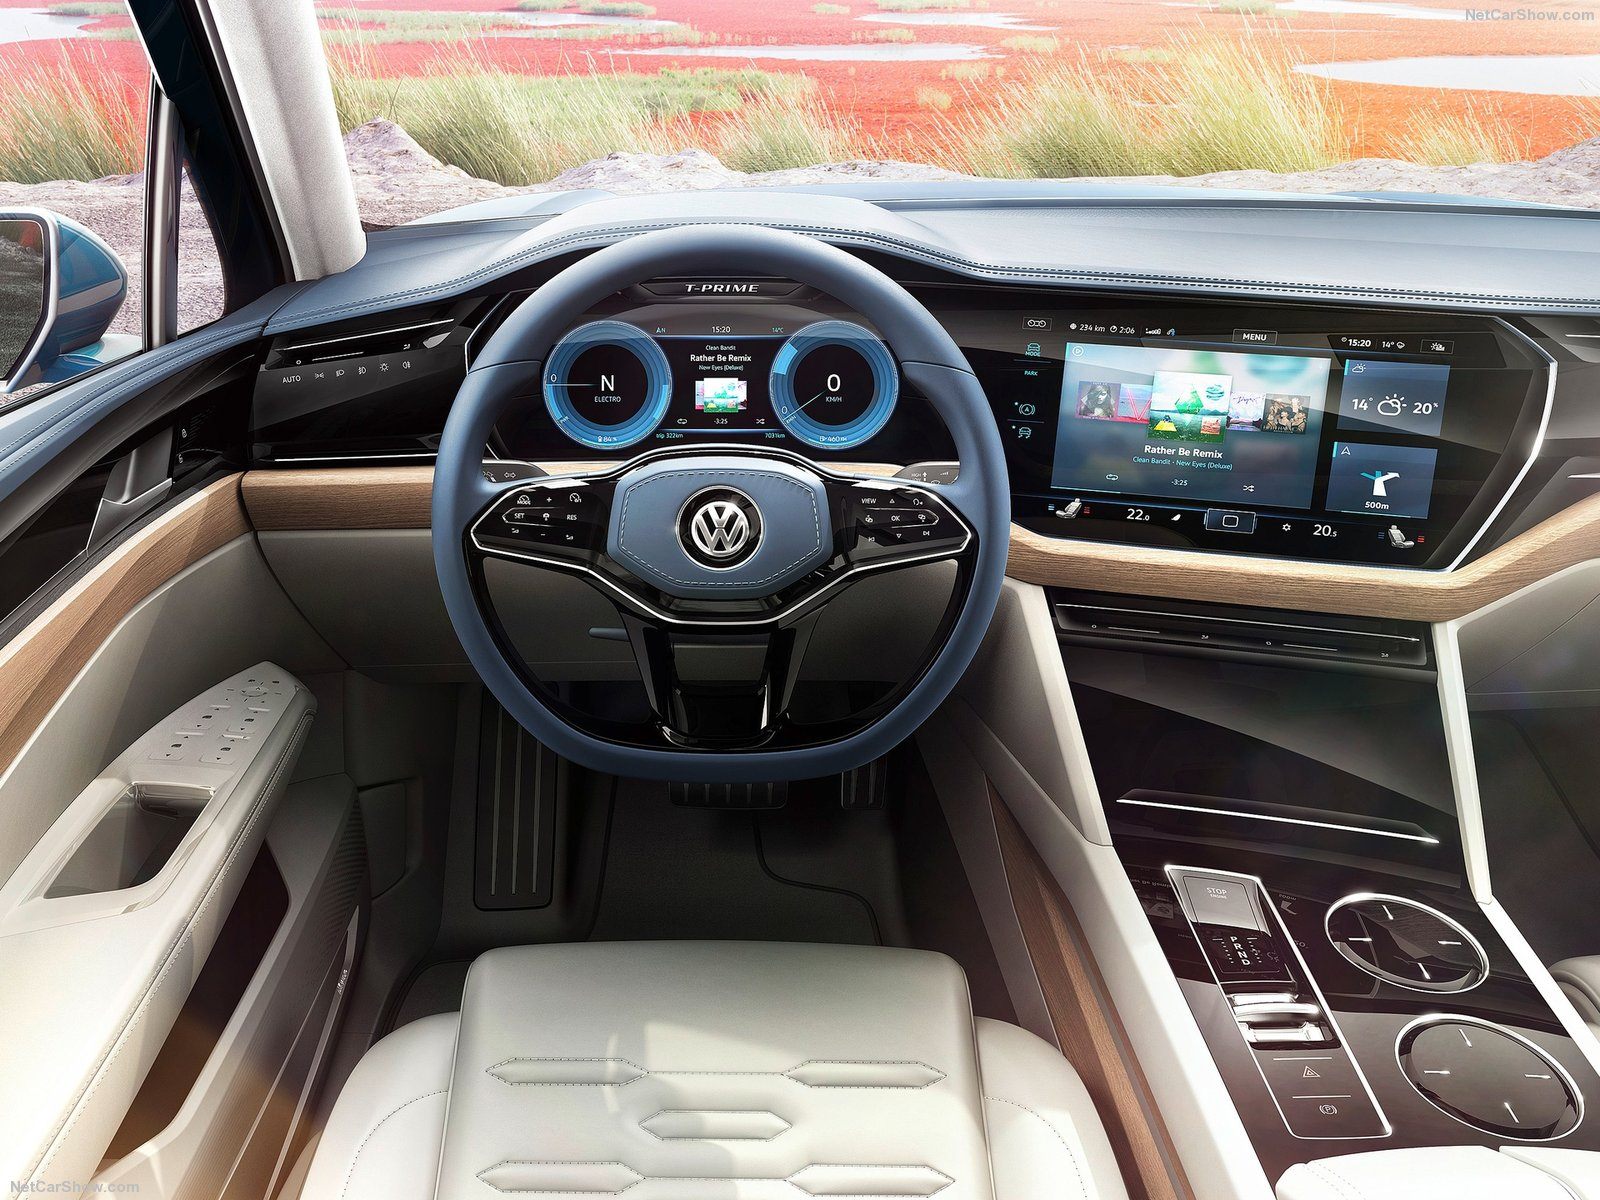 Volkswagen-T-Prime_GTE_Concept-2016-1600-18